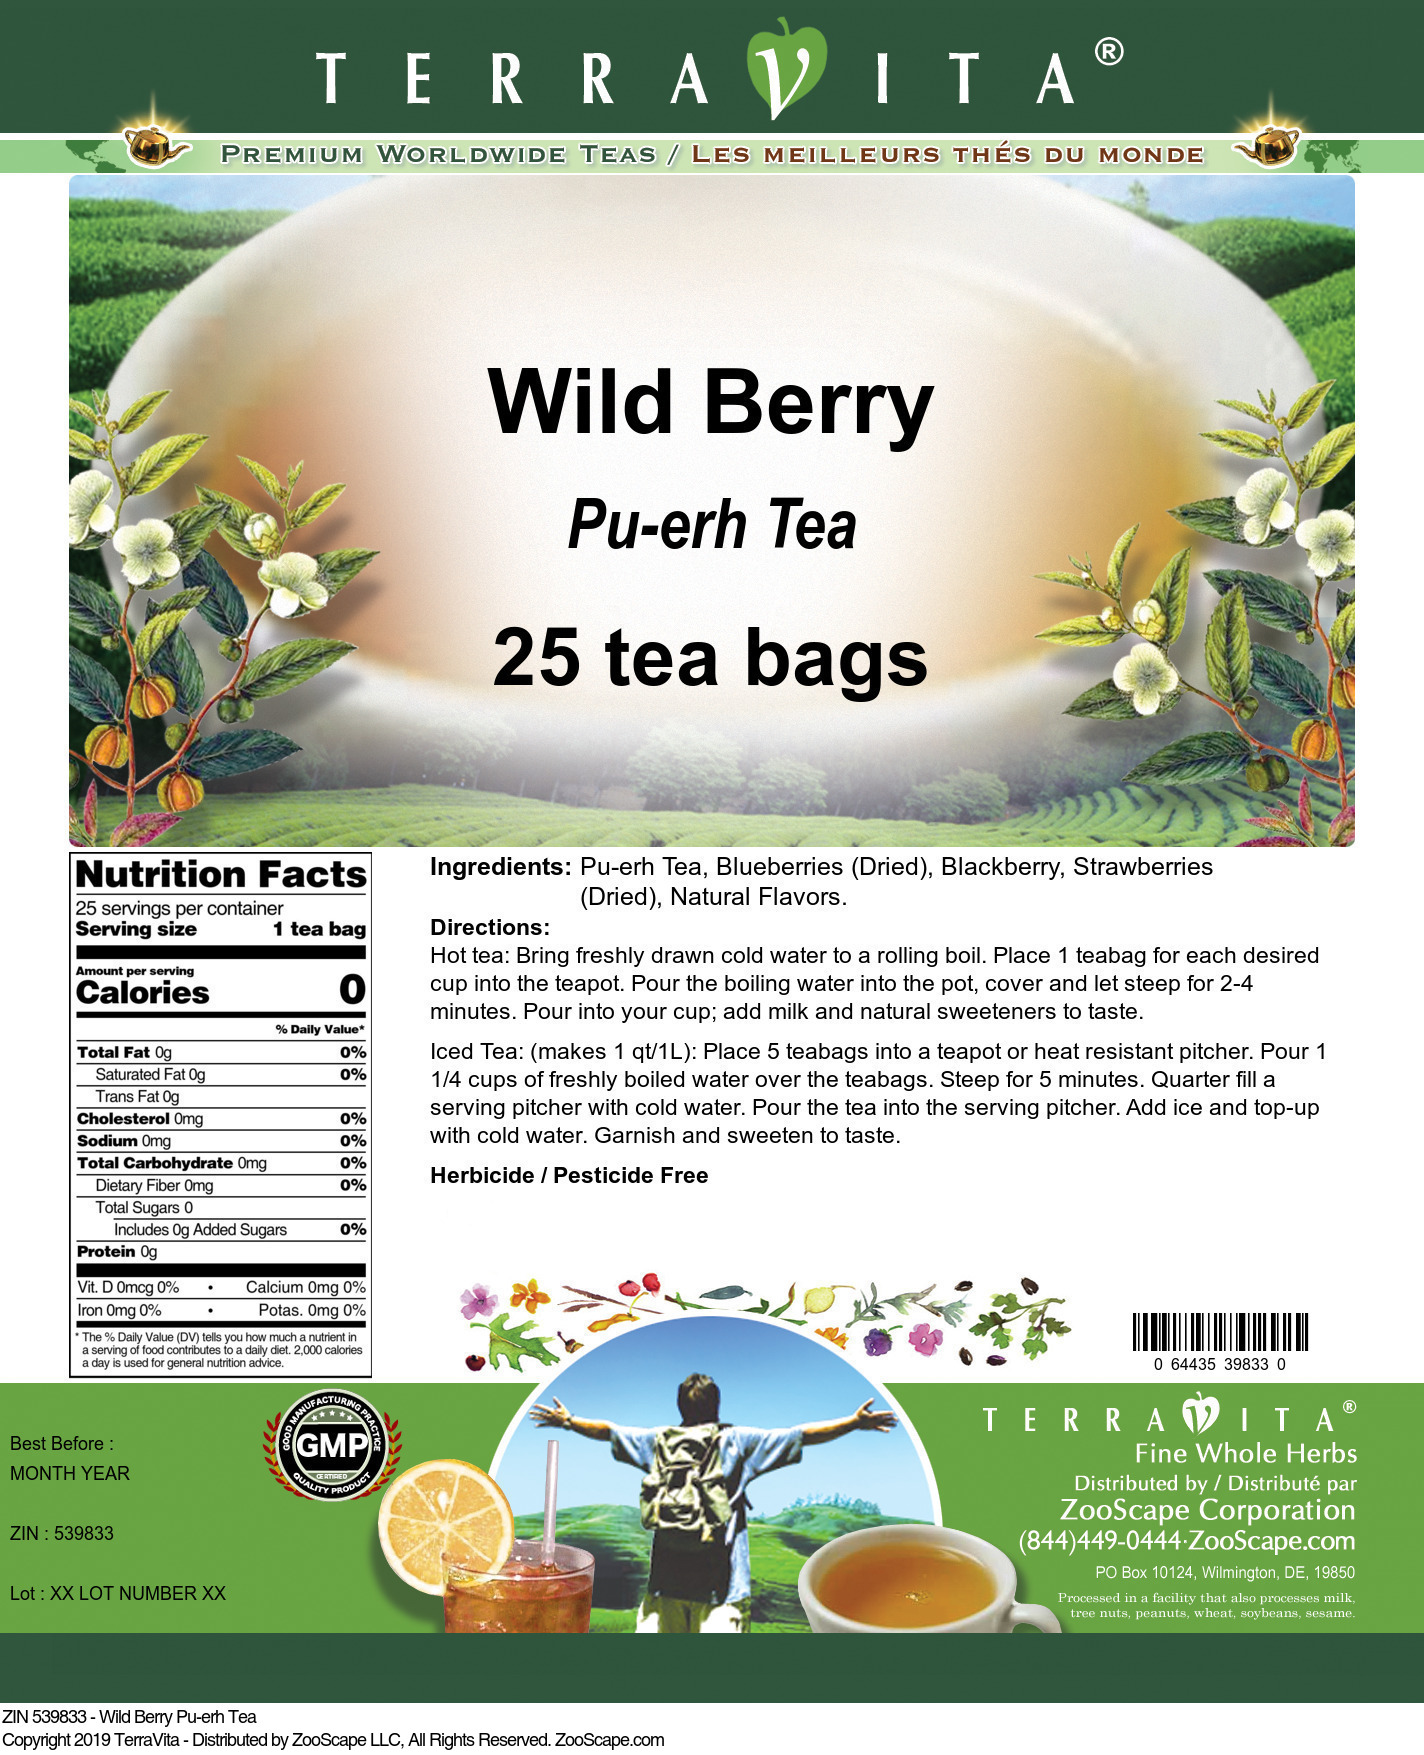 Wild Berry Pu-erh Tea